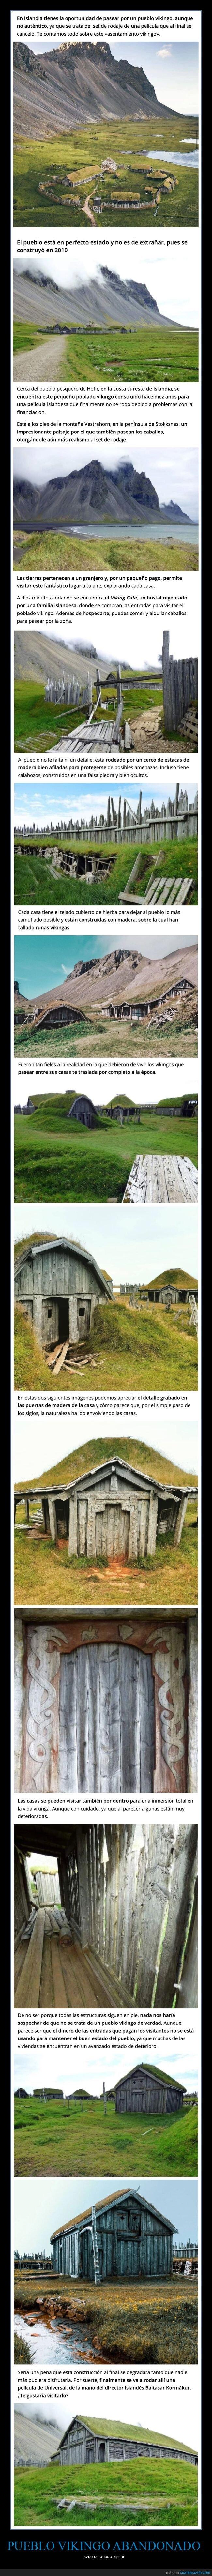 curiosidades,islandia,pueblo vikingo,set de rodaje